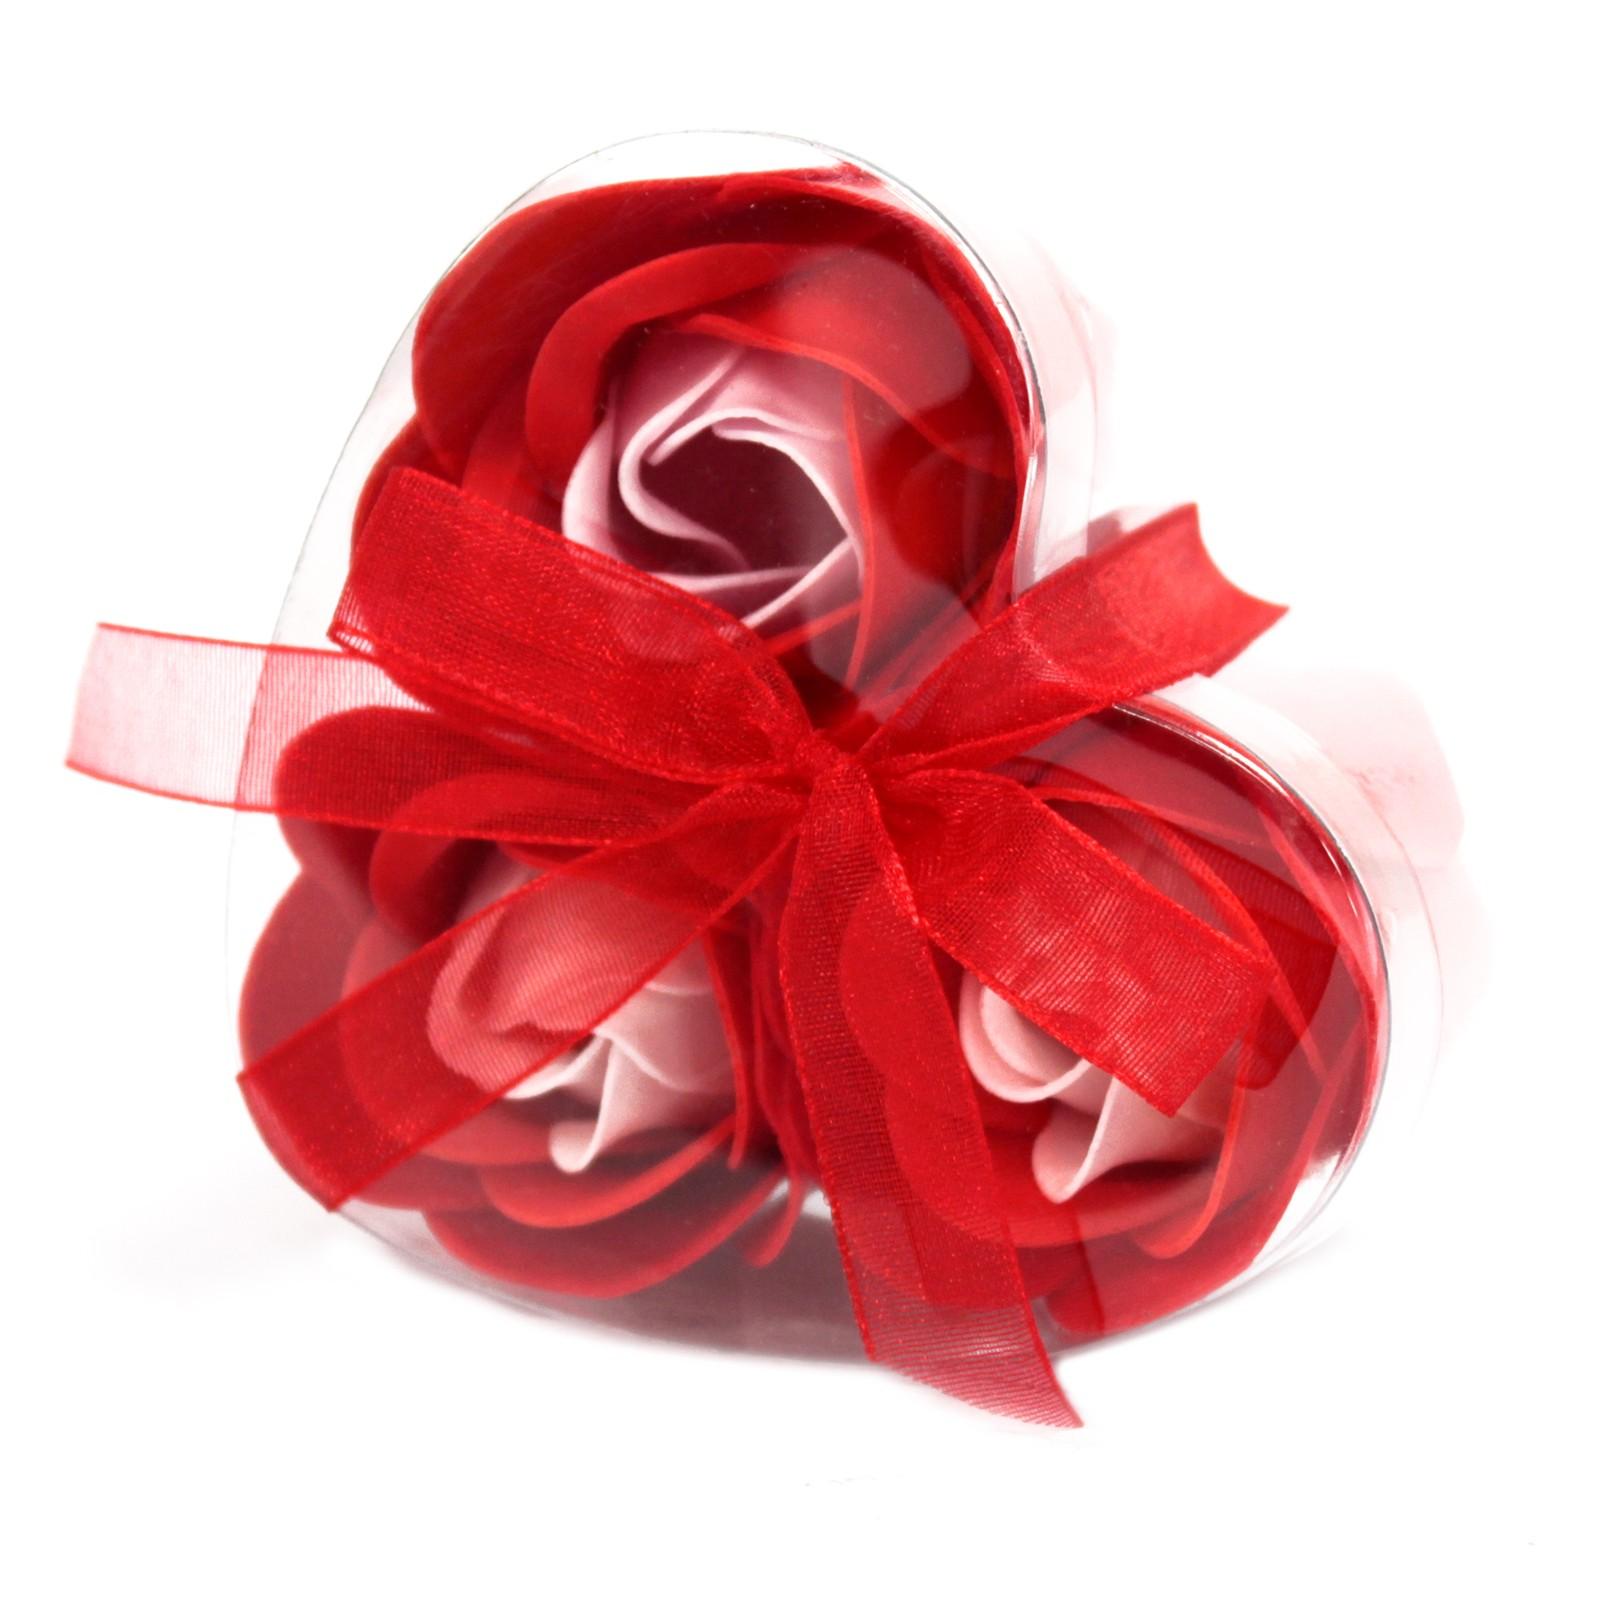 Set of 3 Soap Flower Heart Box Red Roses